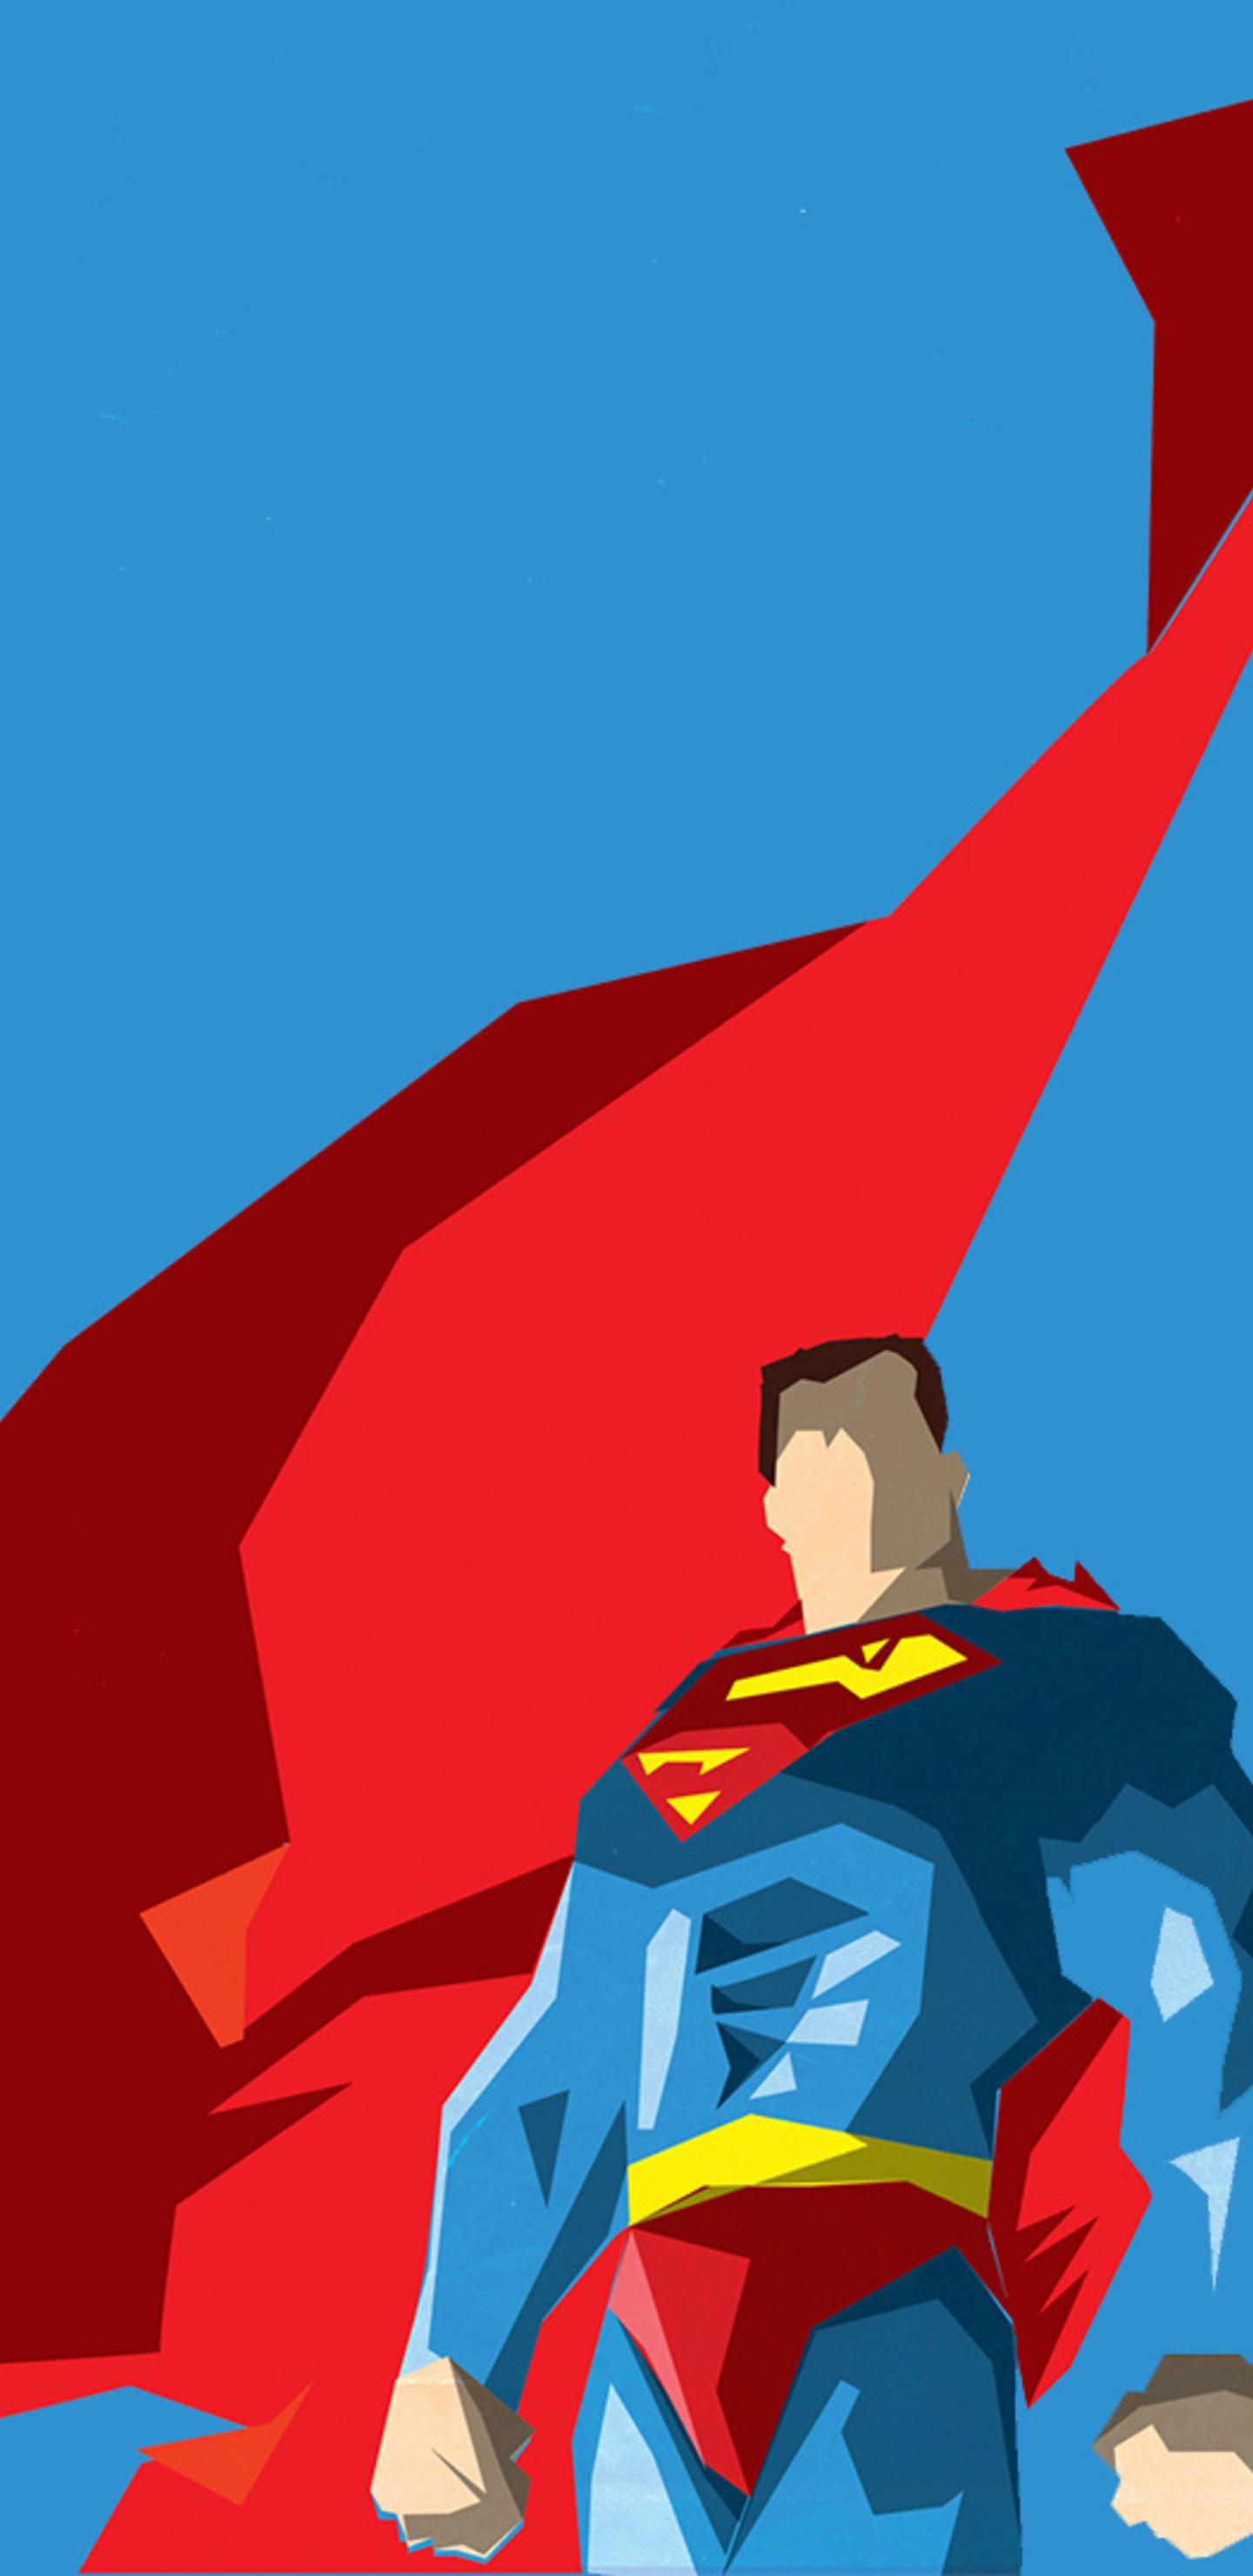 superman-flying-cape-artwork-hd.jpg